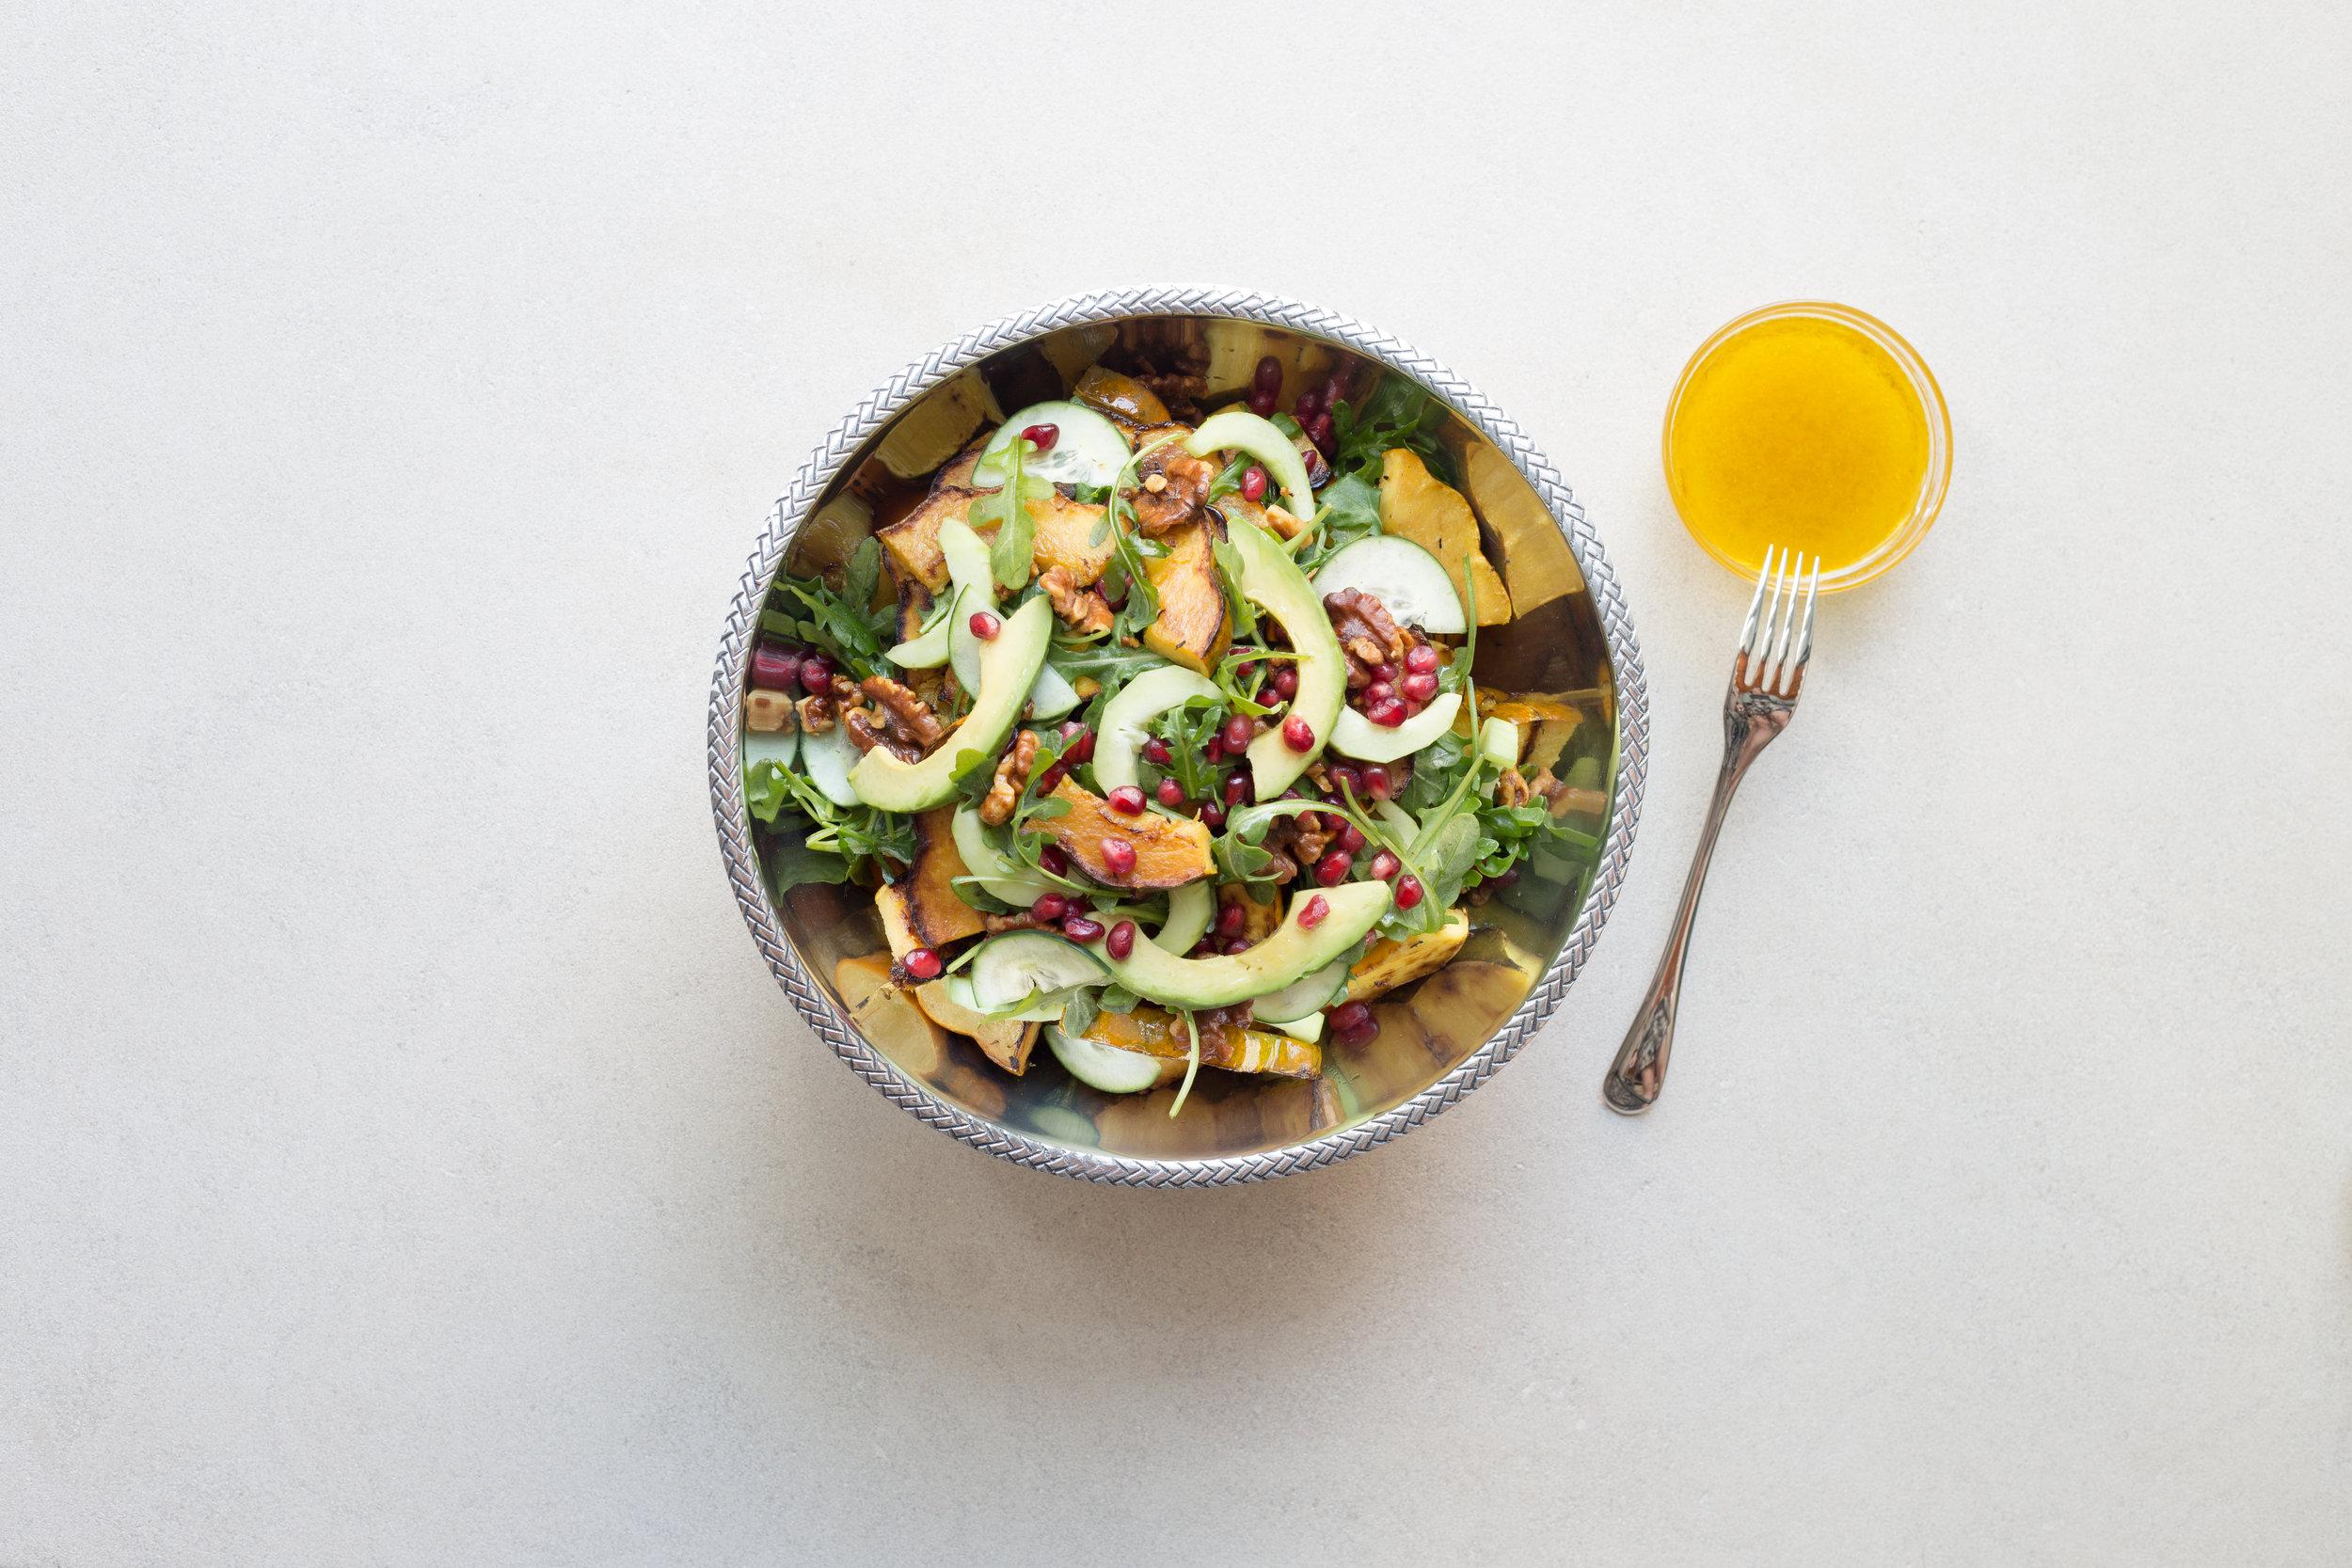 Karina Heinrich_Fall Salad Dressing Fork_Credit LX MGMT.jpg